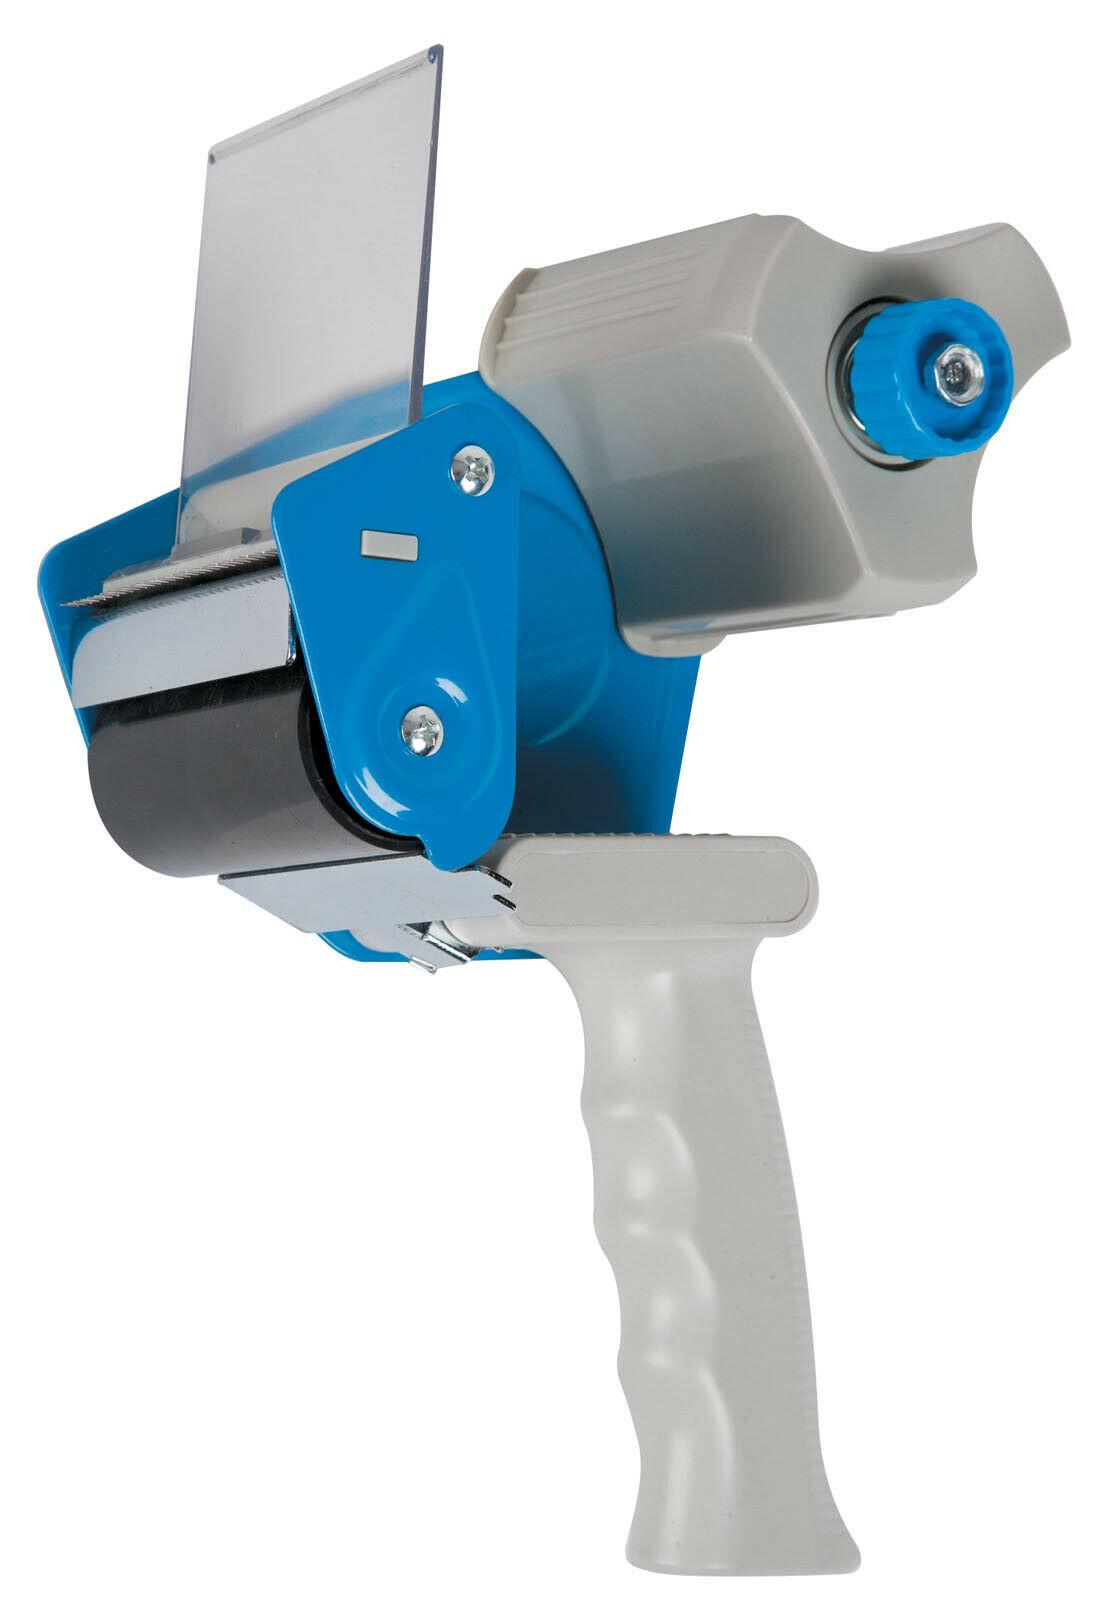 PD742 Ergonomic Grip Tape Dispenser Gun for 75mm Wide 75mm Core Tape Qty 1